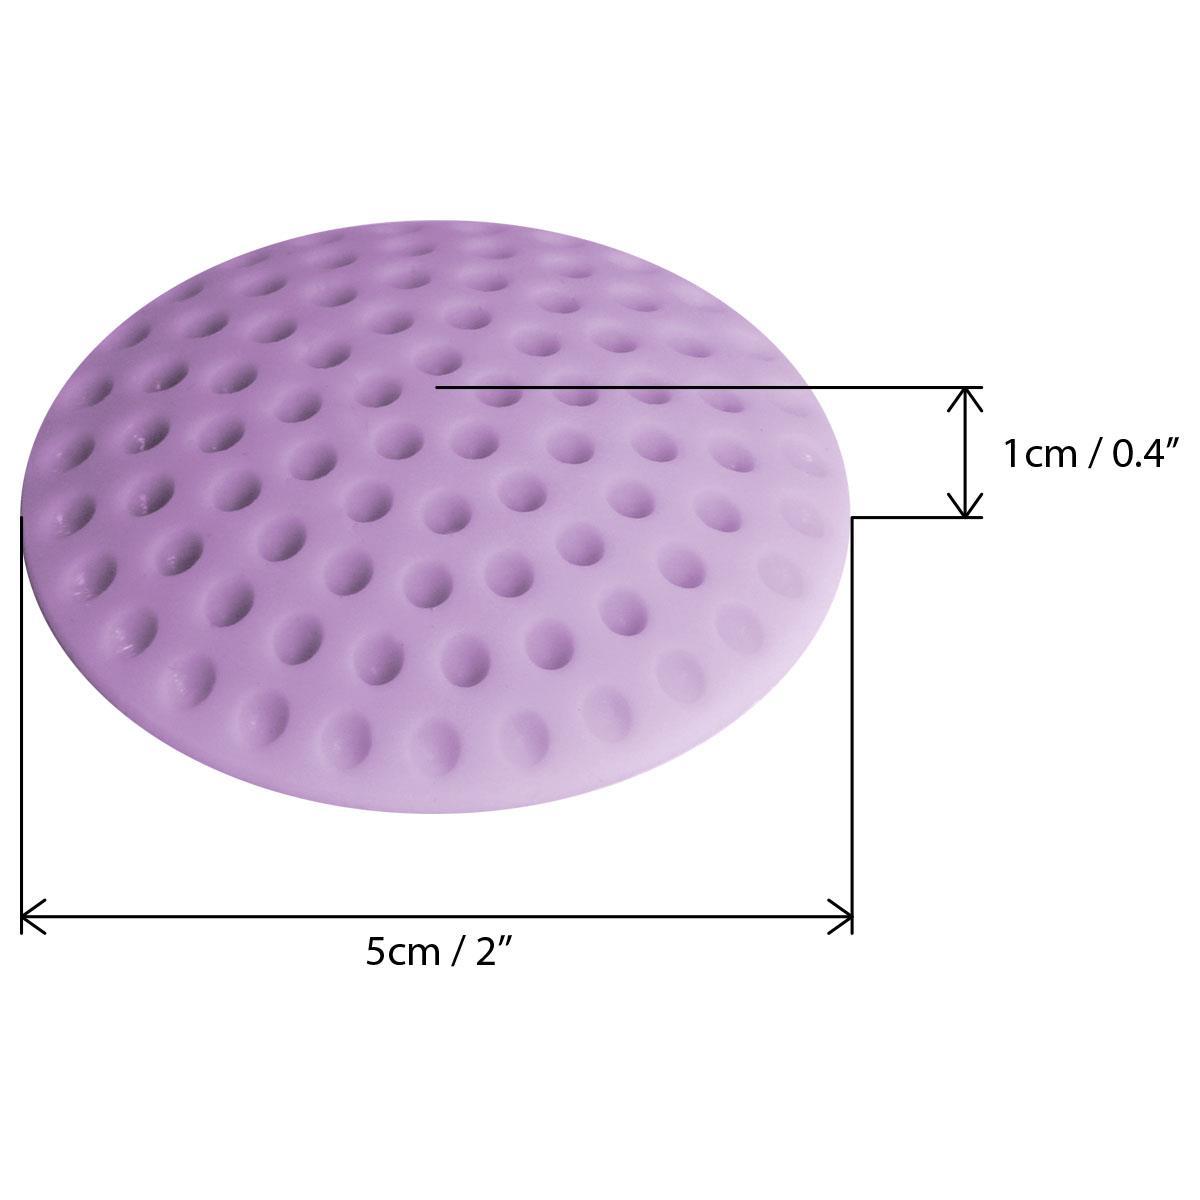 5-x-Wall-Protector-Self-Adhesive-Rubber-Stop-Door-Handle-Bumper-Guard-Stopper miniatuur 4